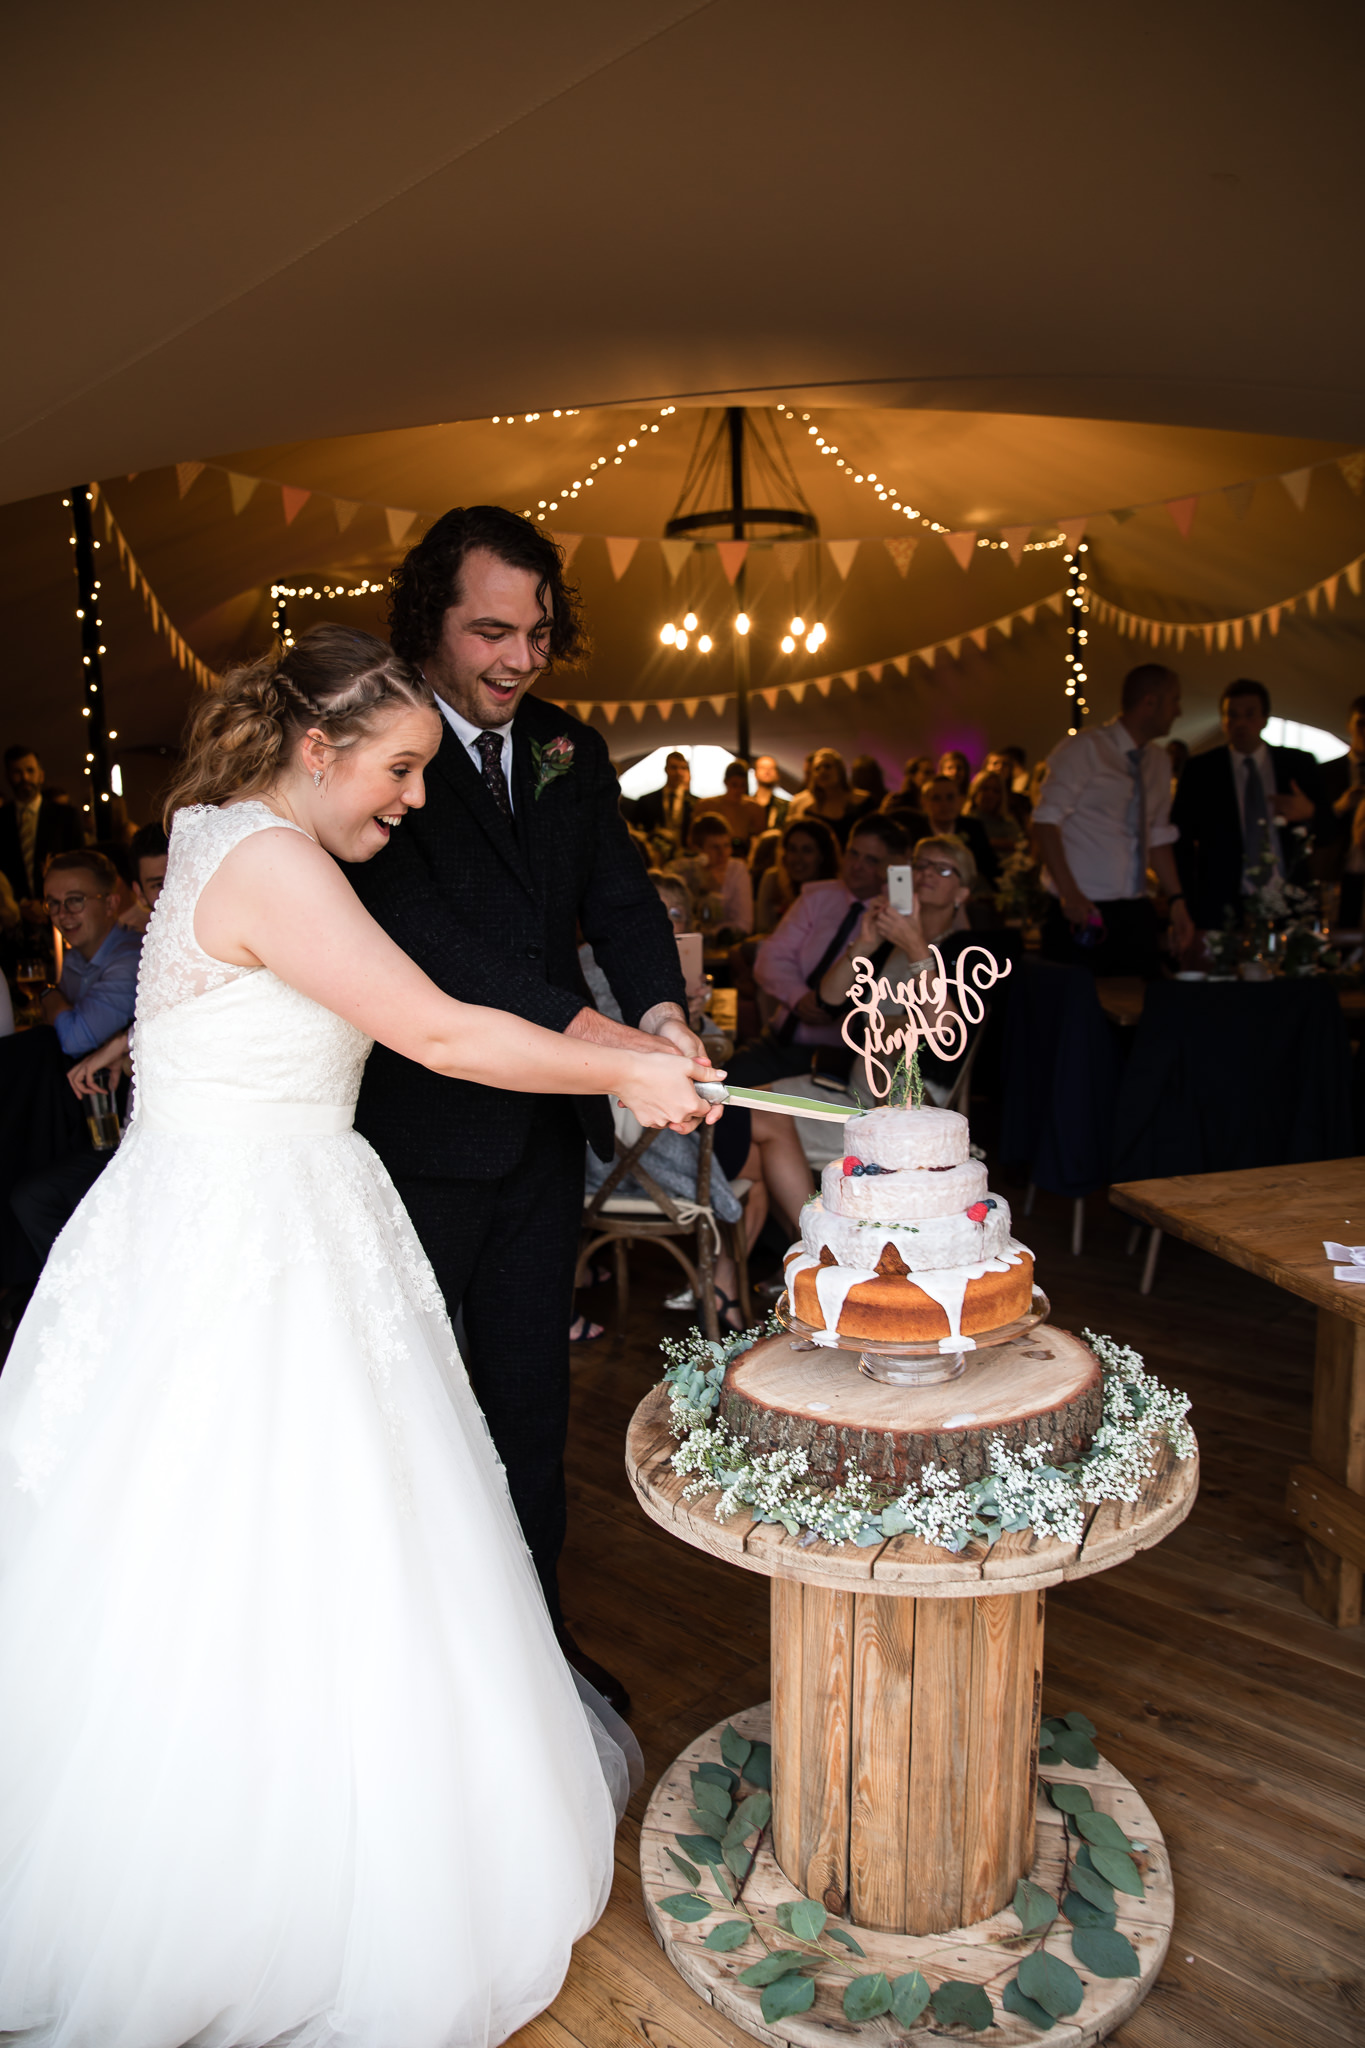 nottingham wedding75